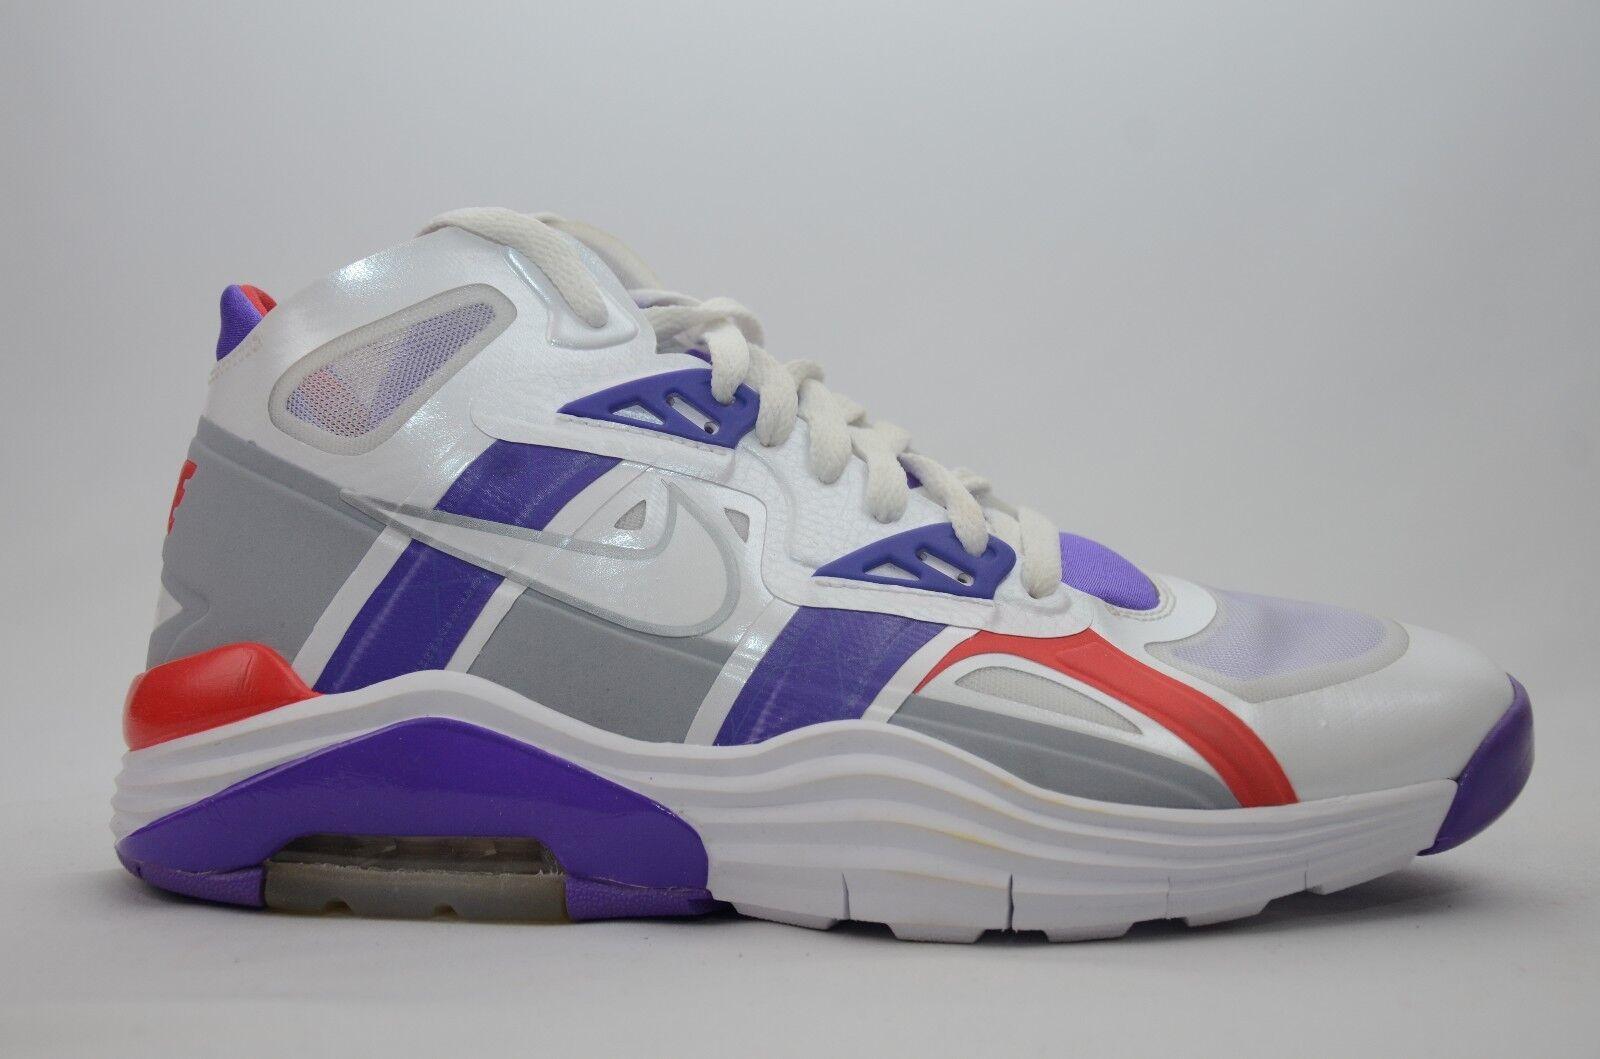 huge discount d9016 194fb Nike Lunar 180 Trainer SC Men s Size 9 9 9 New in Box NO Top Lid